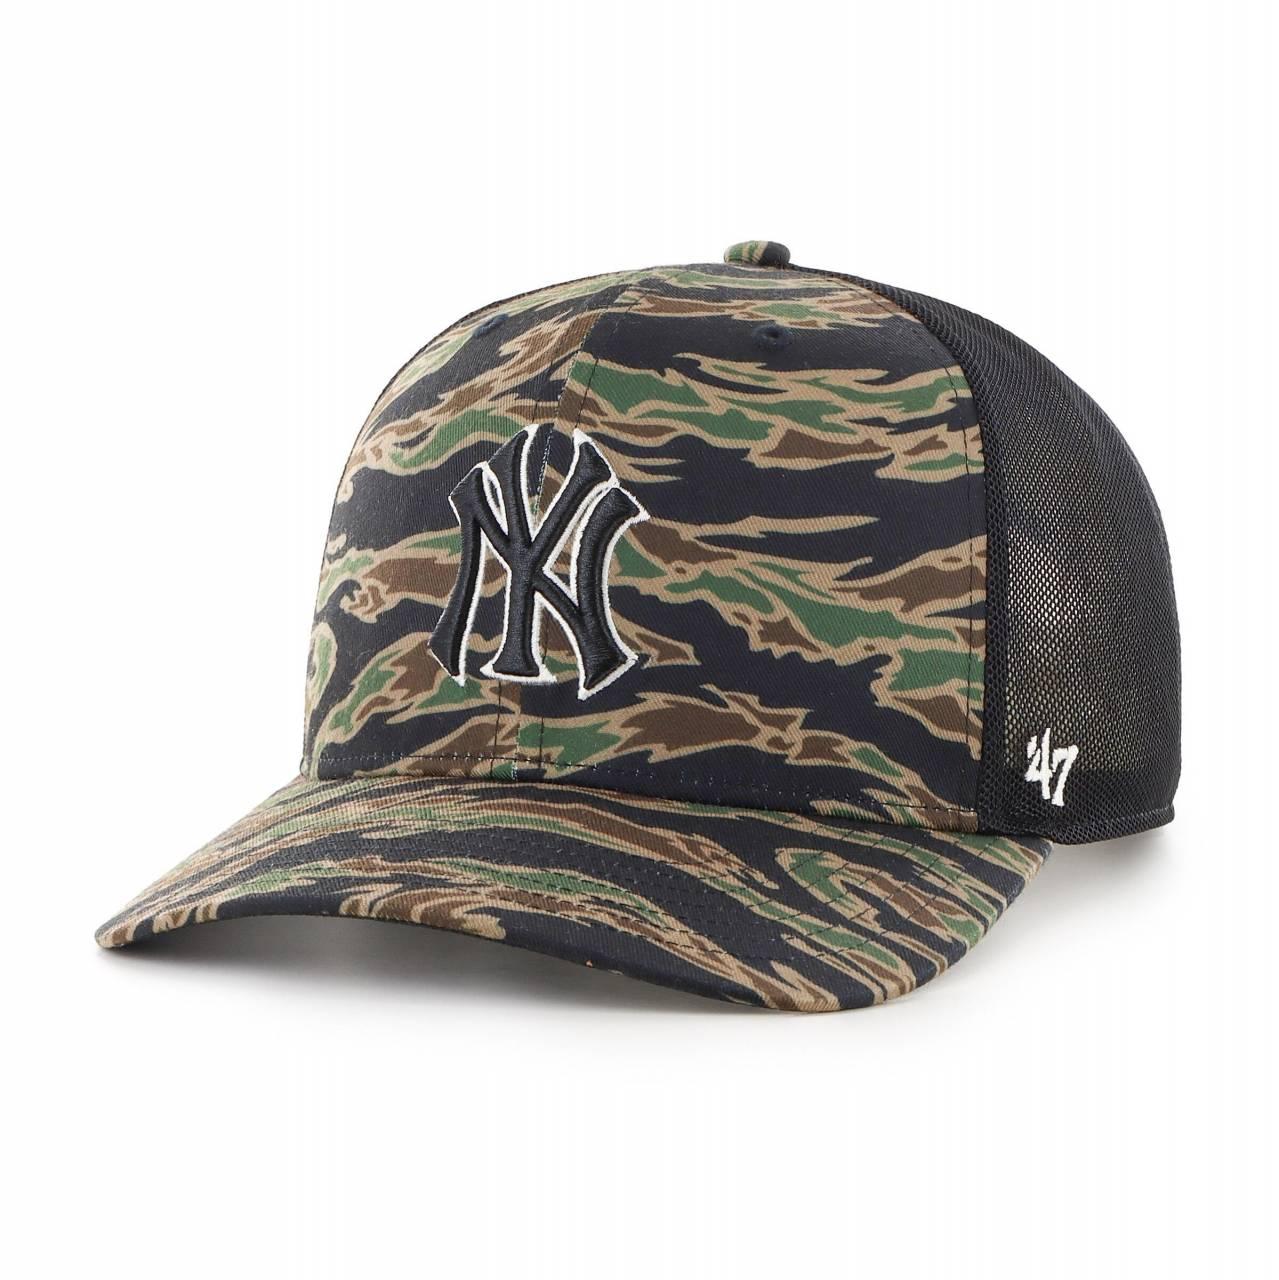 MLB NEW YORK YANKEES DROP ZONE MESH '47 MVP DP CAMO SNAPBACK